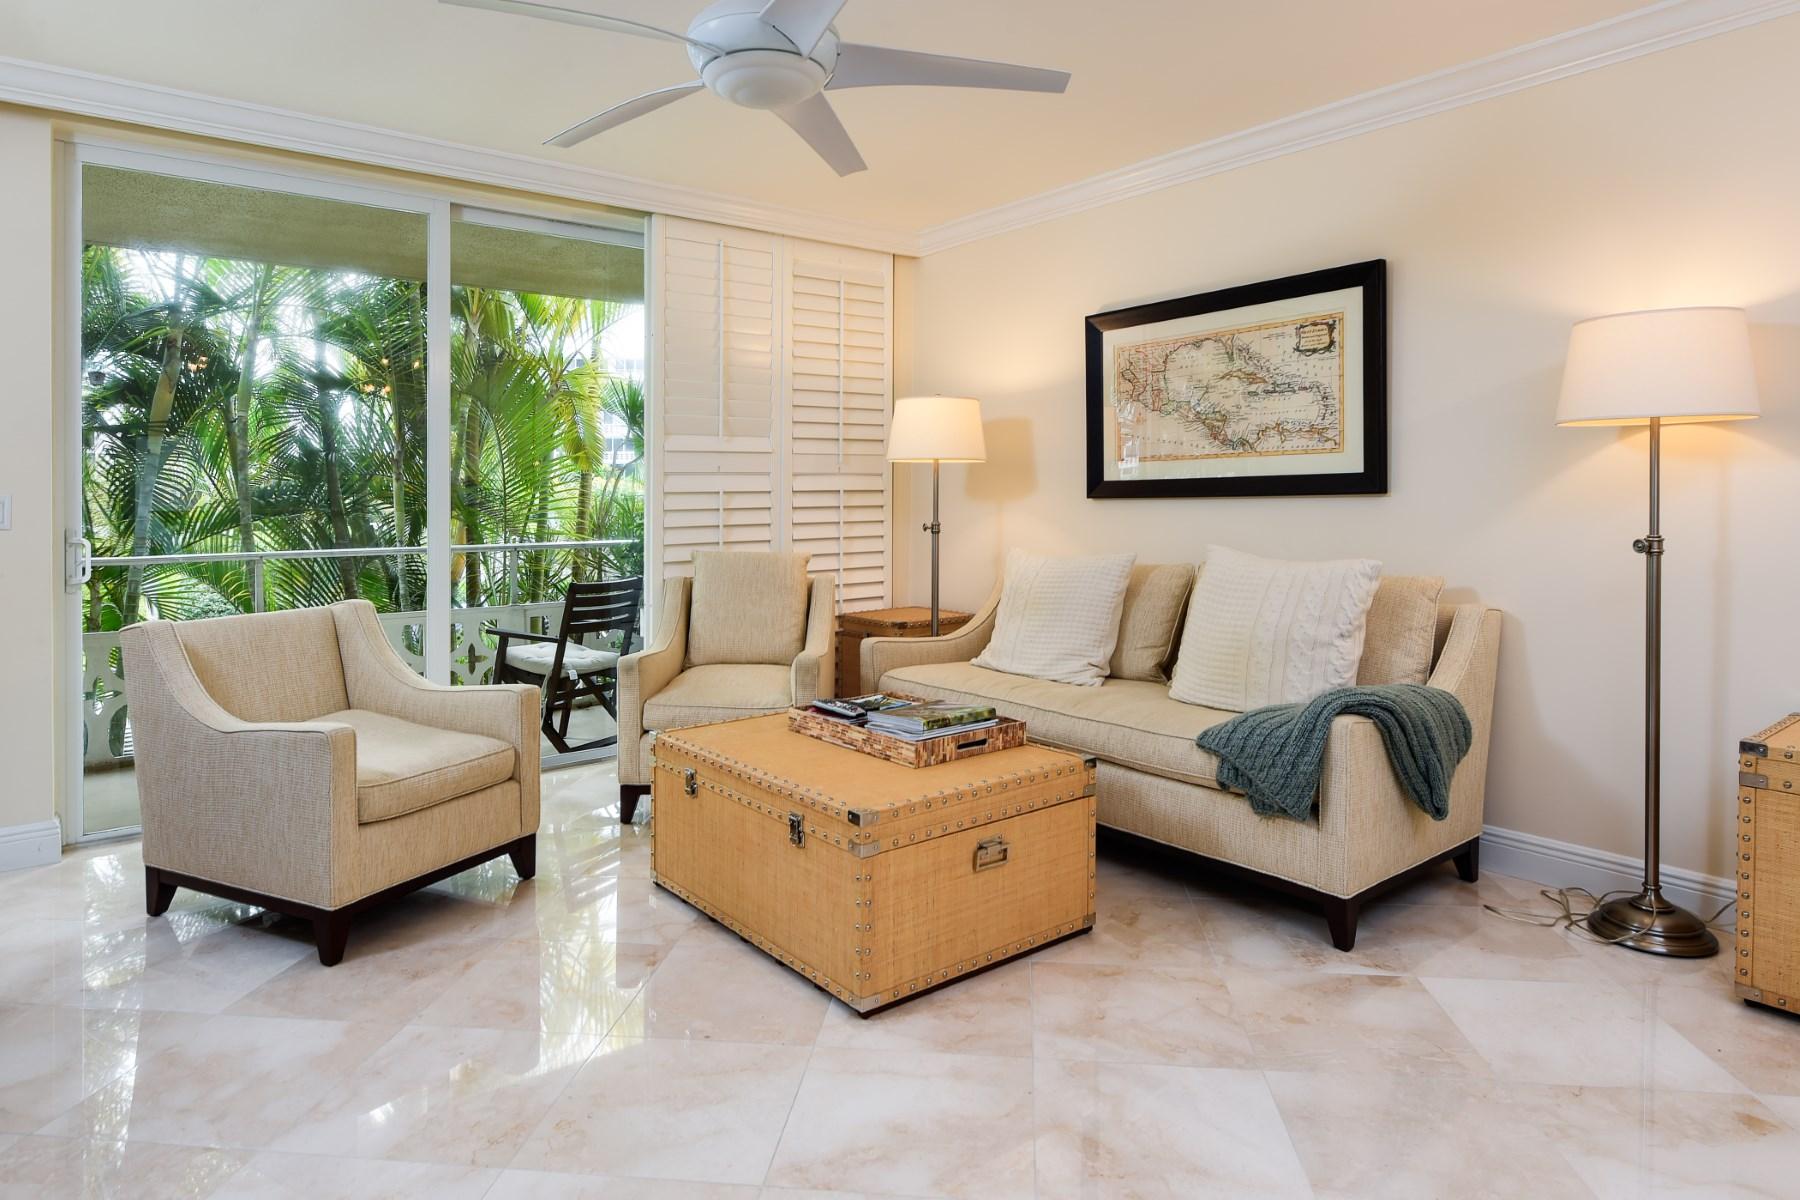 Condominium for Sale at In-Town Ocean Block 139 Sunrise Ave # 2020 Palm Beach, Florida 33480 United States